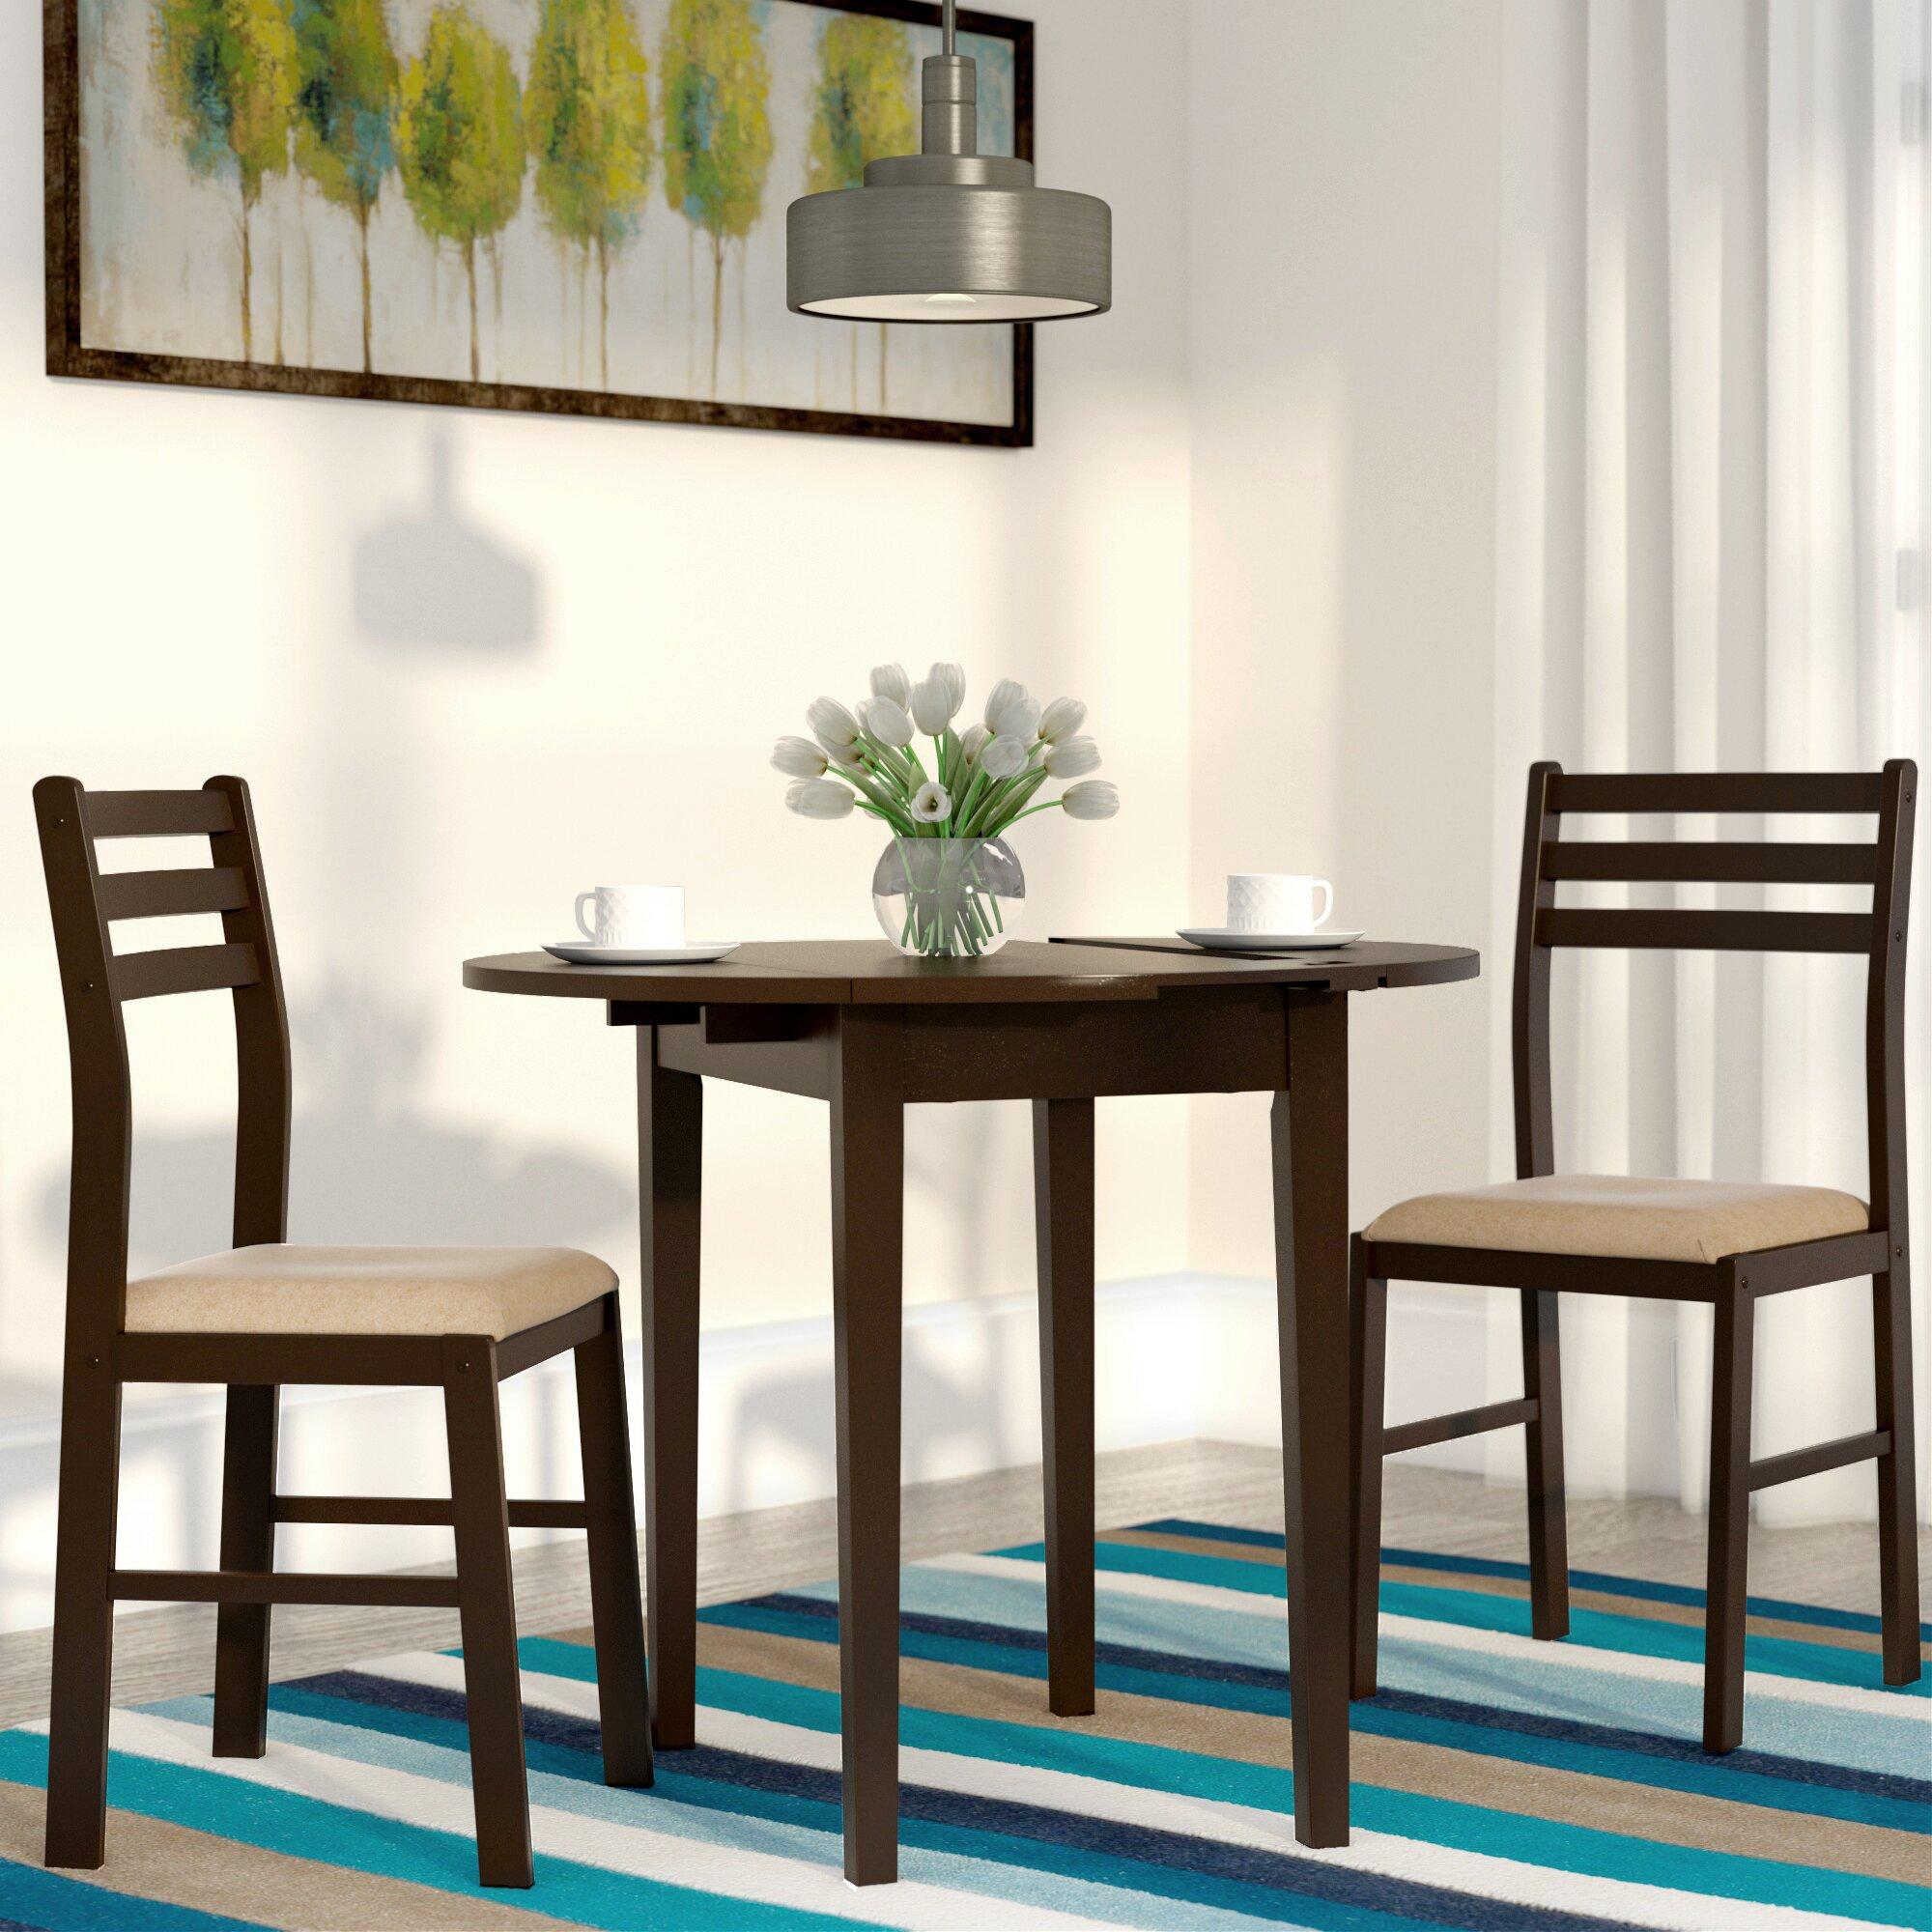 3 Piece Dining Room Set: Andover Mills Lynbrook 3 Piece Dining Set & Reviews